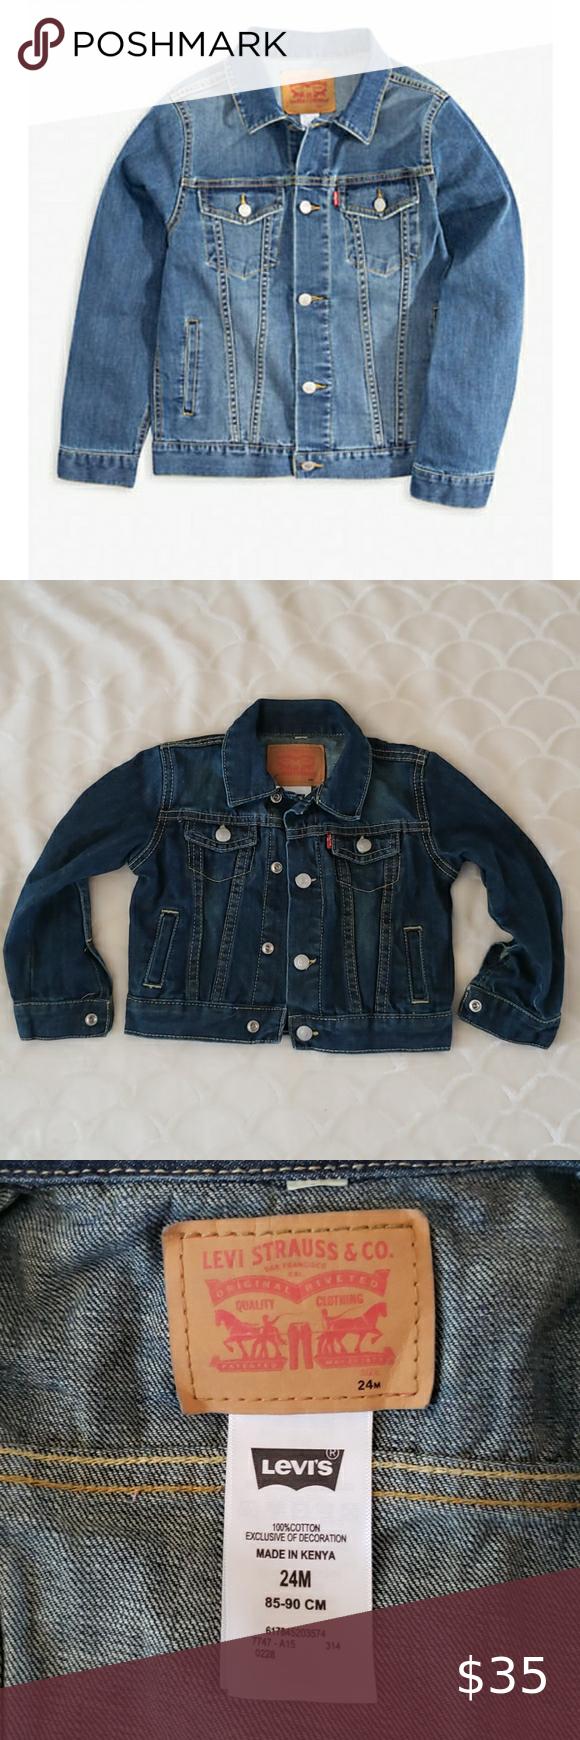 Boys Levi S Trucker Jean Jacket Size 24m N Brand New Tags Just Removed Boys Size 24 Months Levi S Girls Denim Jacket Kids Jeans Jacket Classic Denim Jacket [ 1740 x 580 Pixel ]